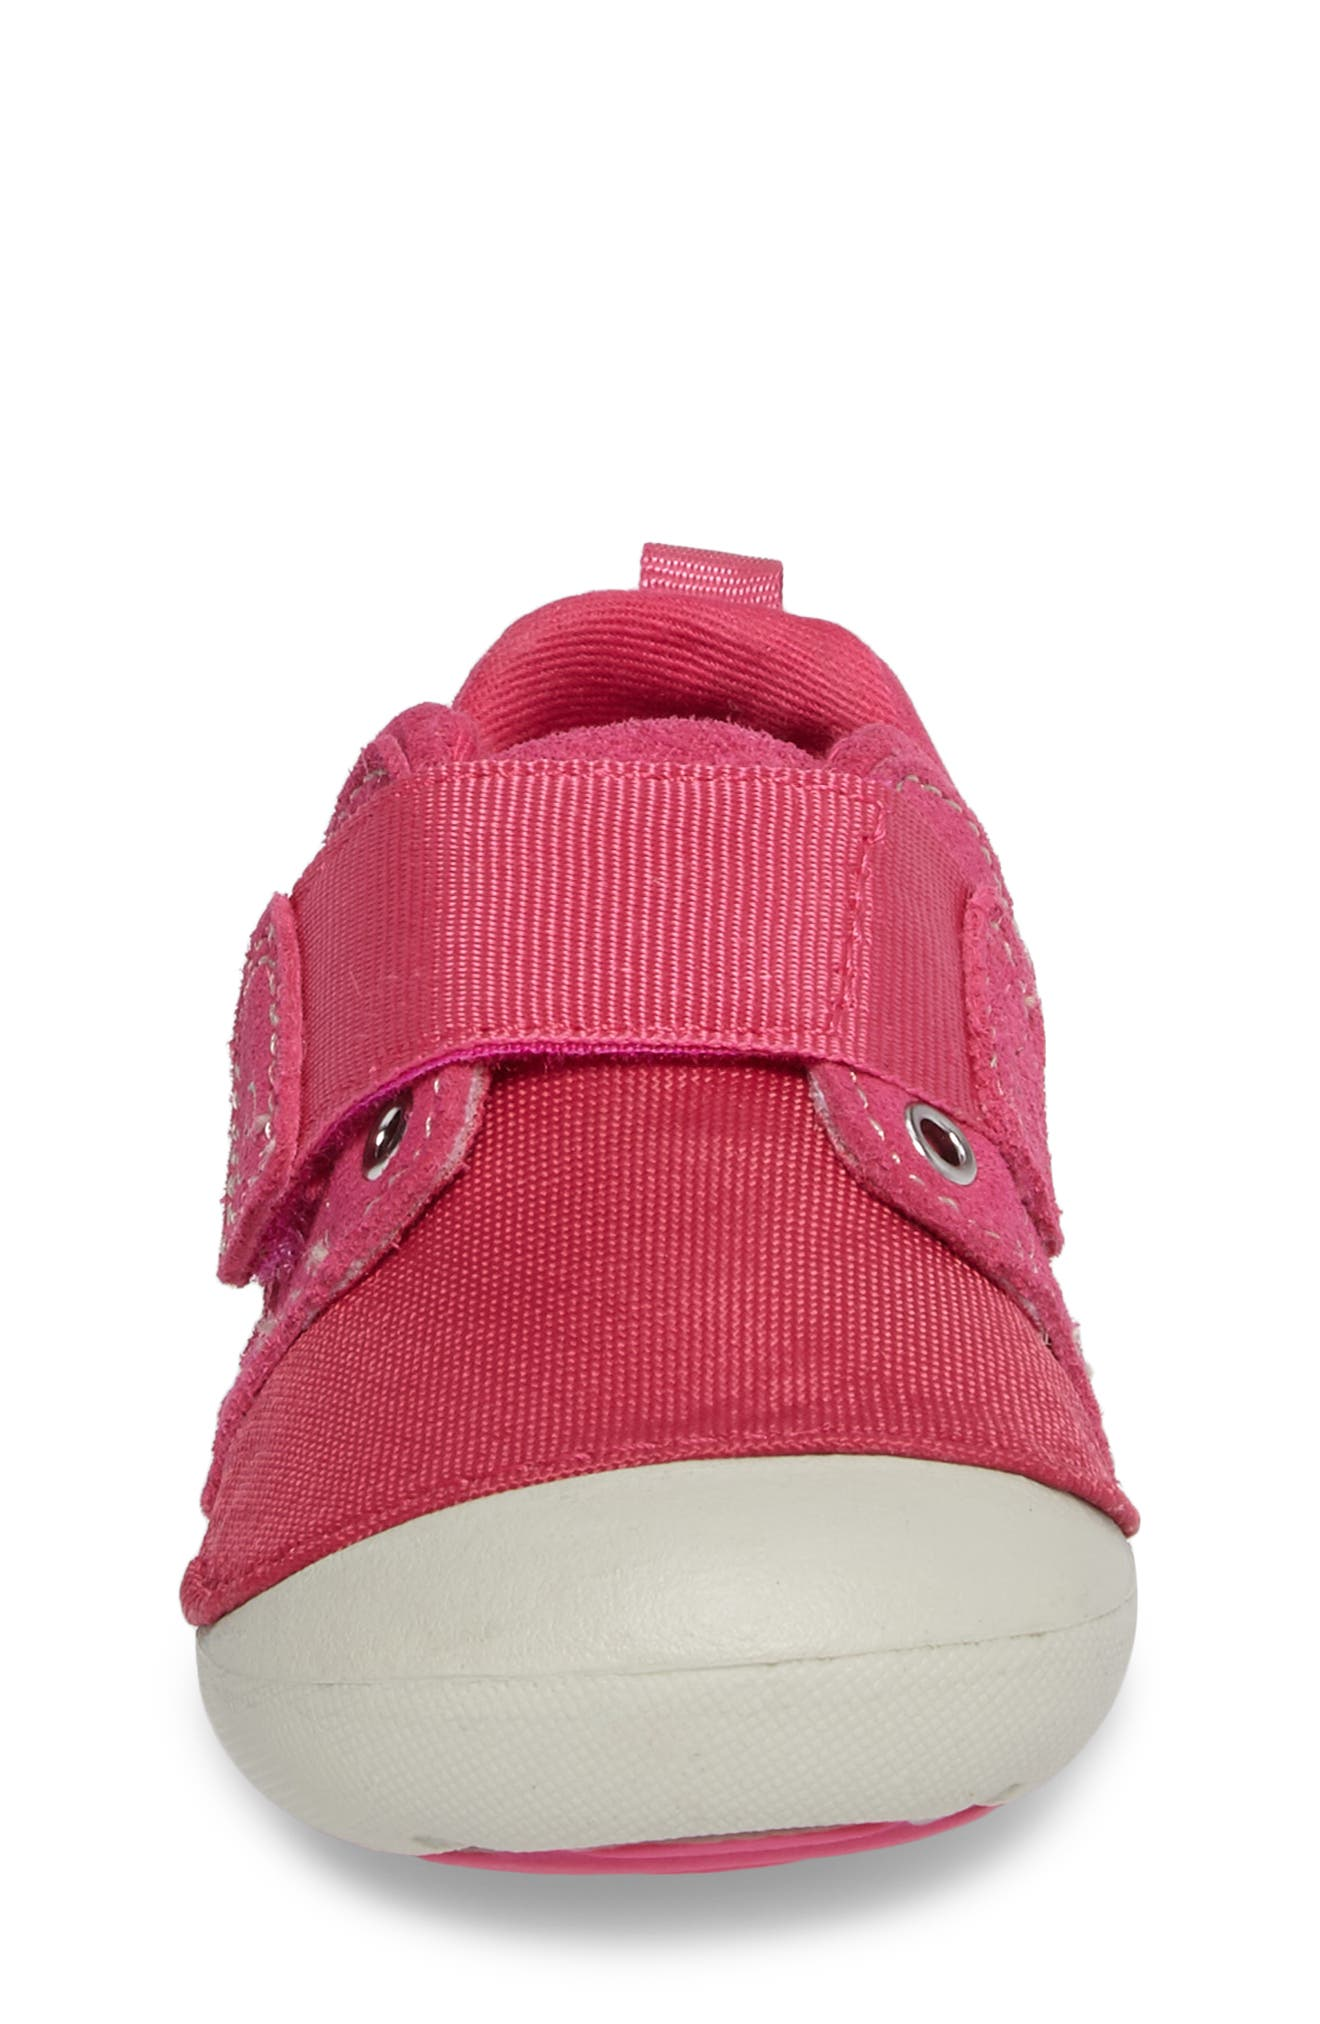 Alternate Image 4  - Stride Rite Soft Motion™ Cameron Sneaker (Baby & Walker)